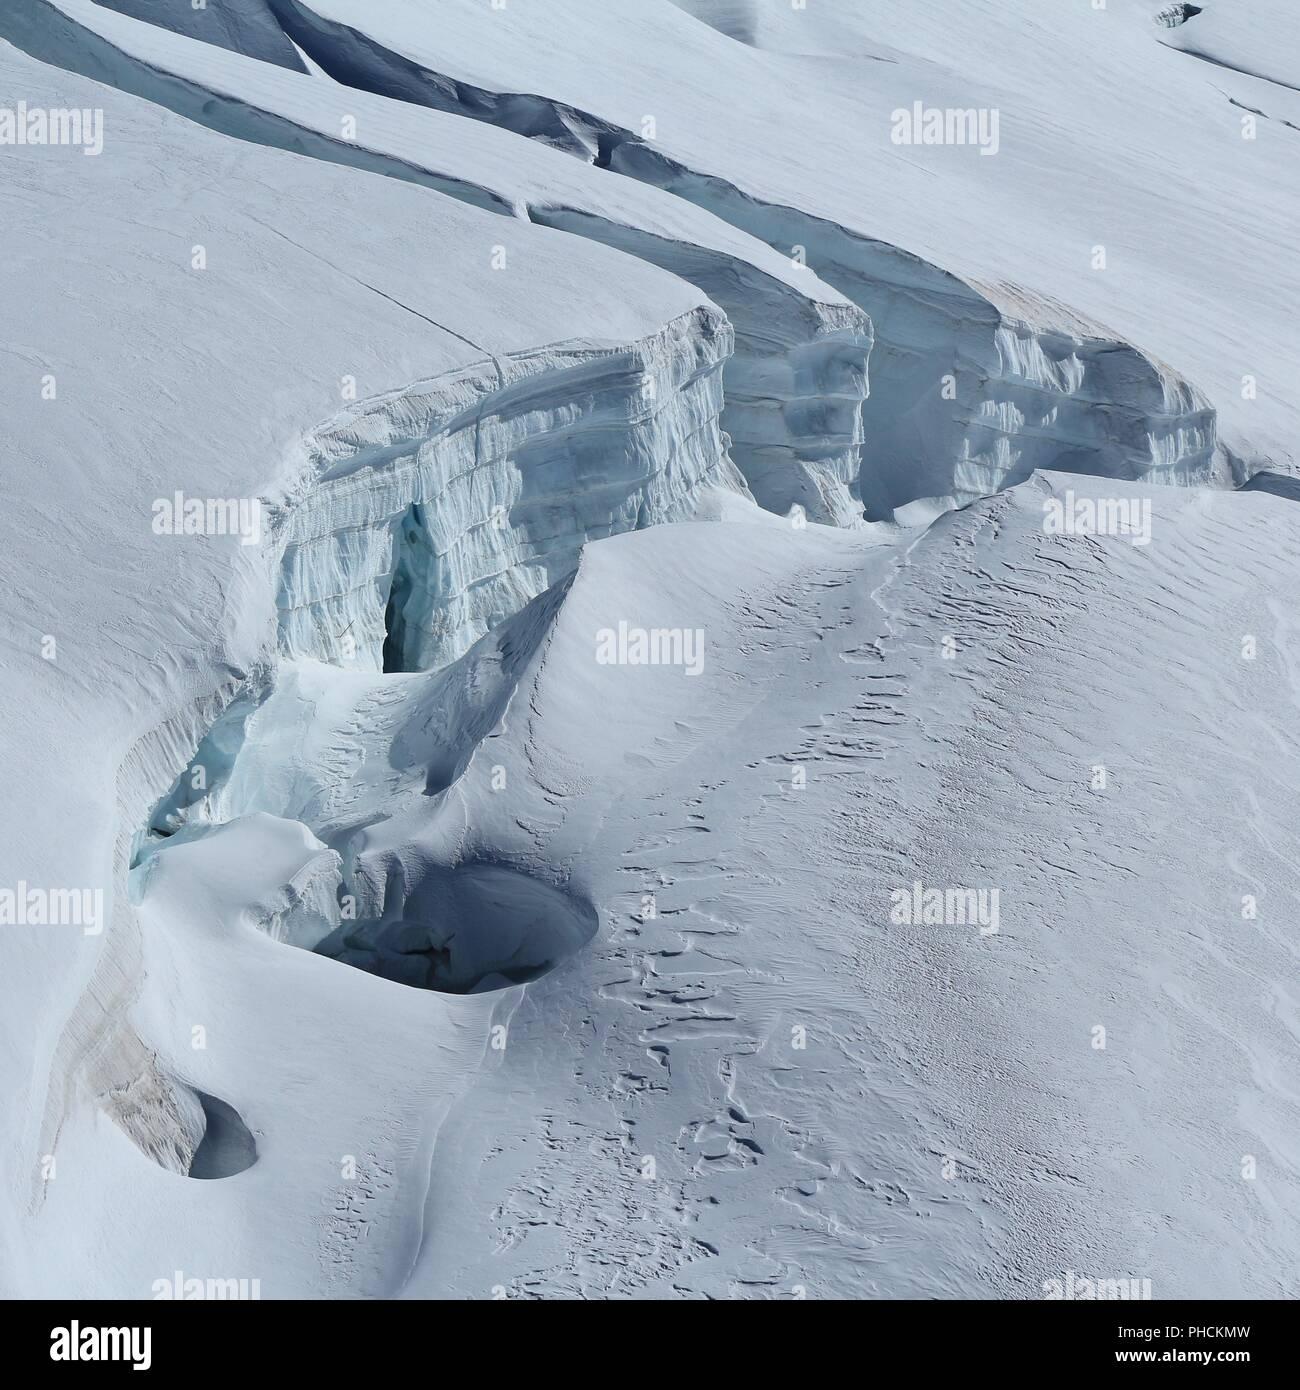 Large crevasse, detail of the Aletsch glacier, Switzerland. - Stock Image